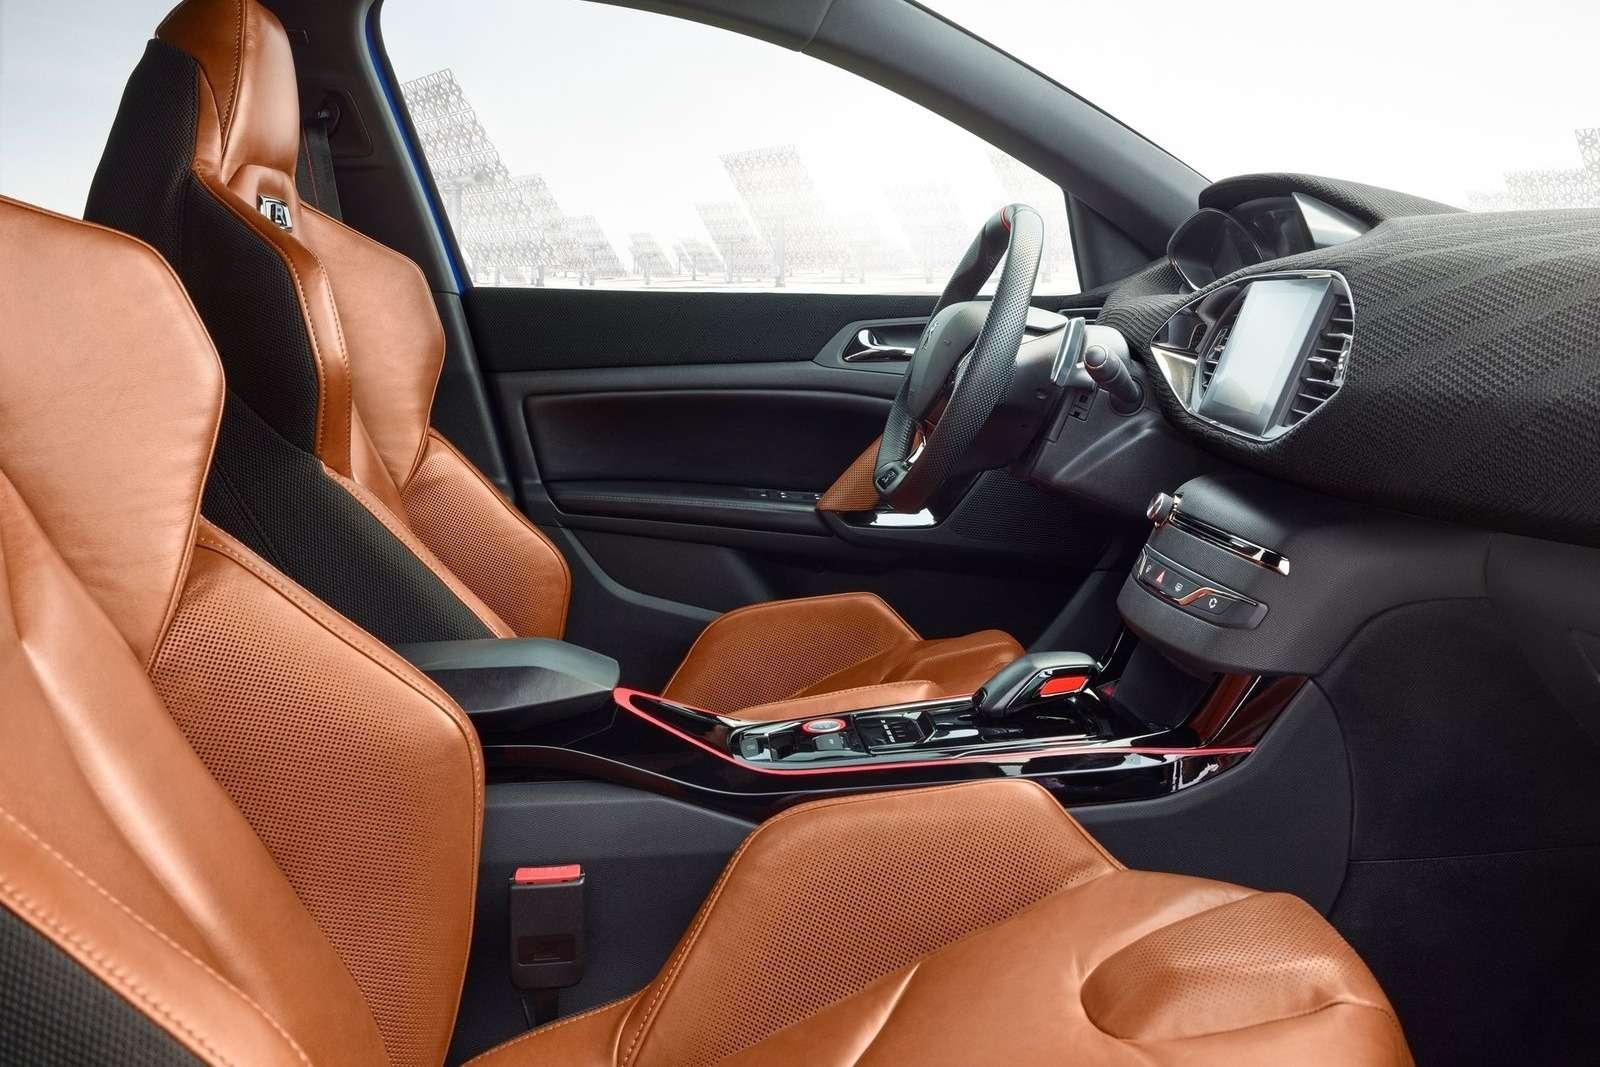 Peugeot-308_R_HYbrid_Concept_2015_1600x1200_wallpaper_08